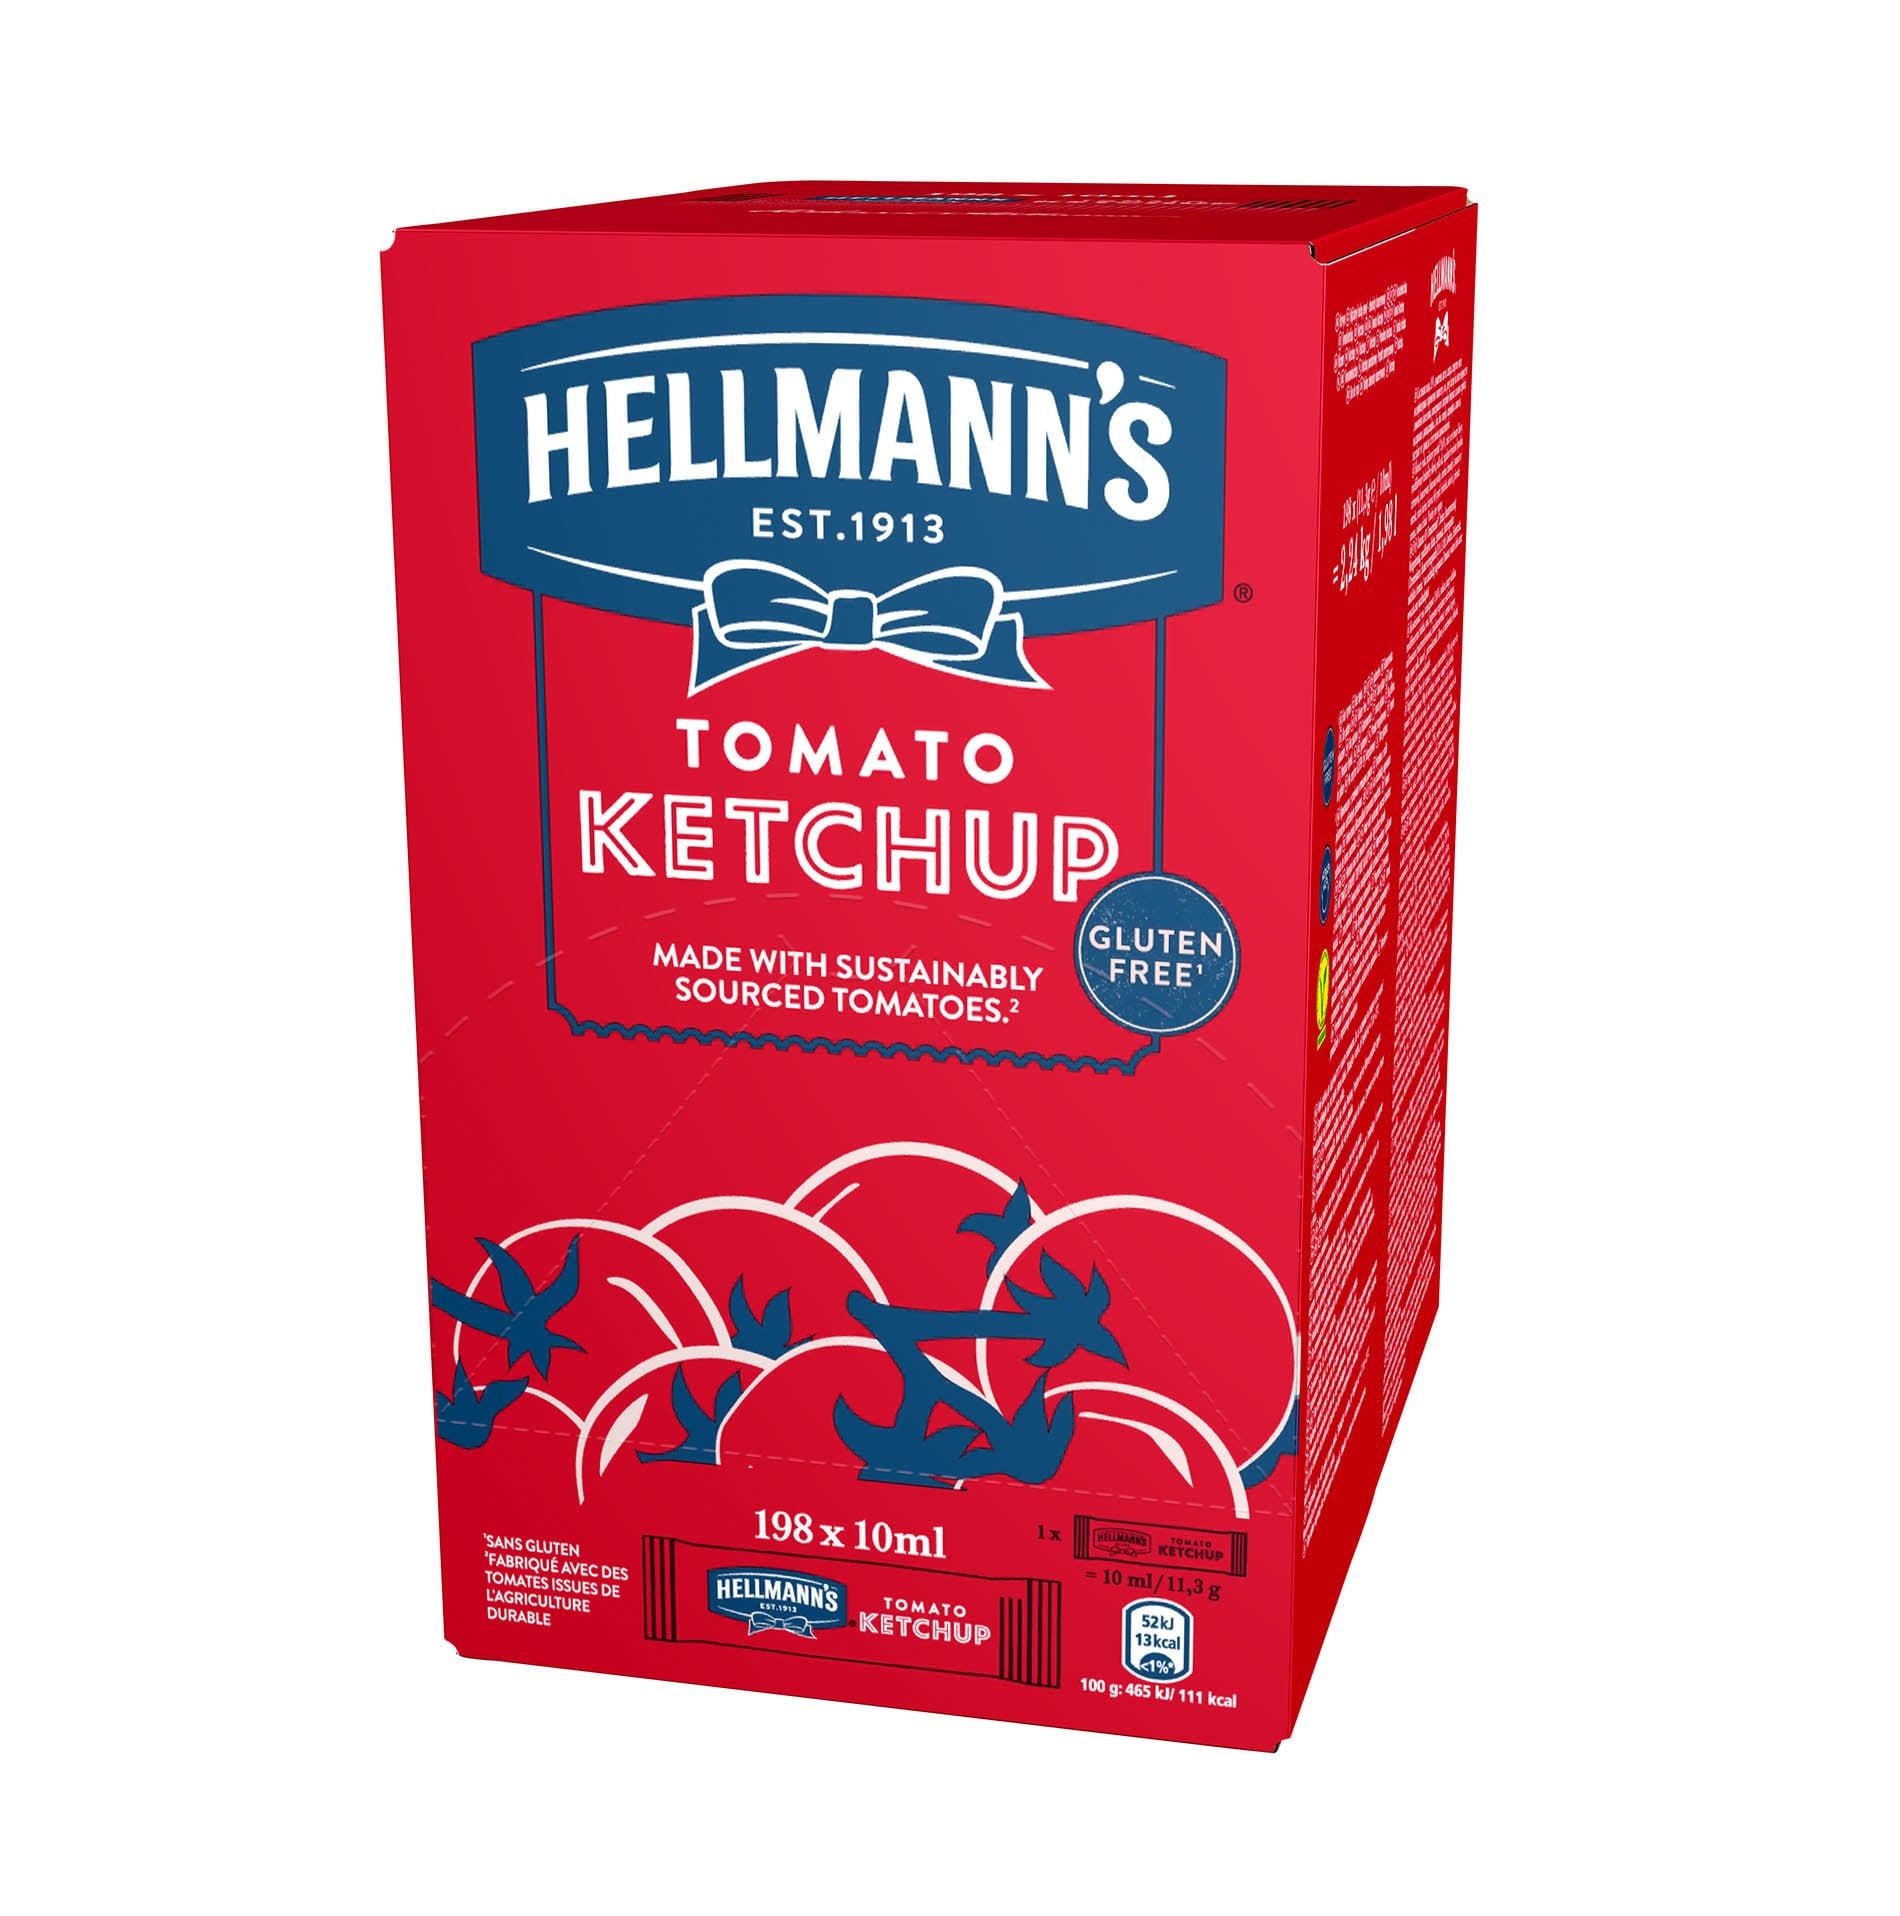 Hellmann's Tomato Ketchup - Tomato Ketchup